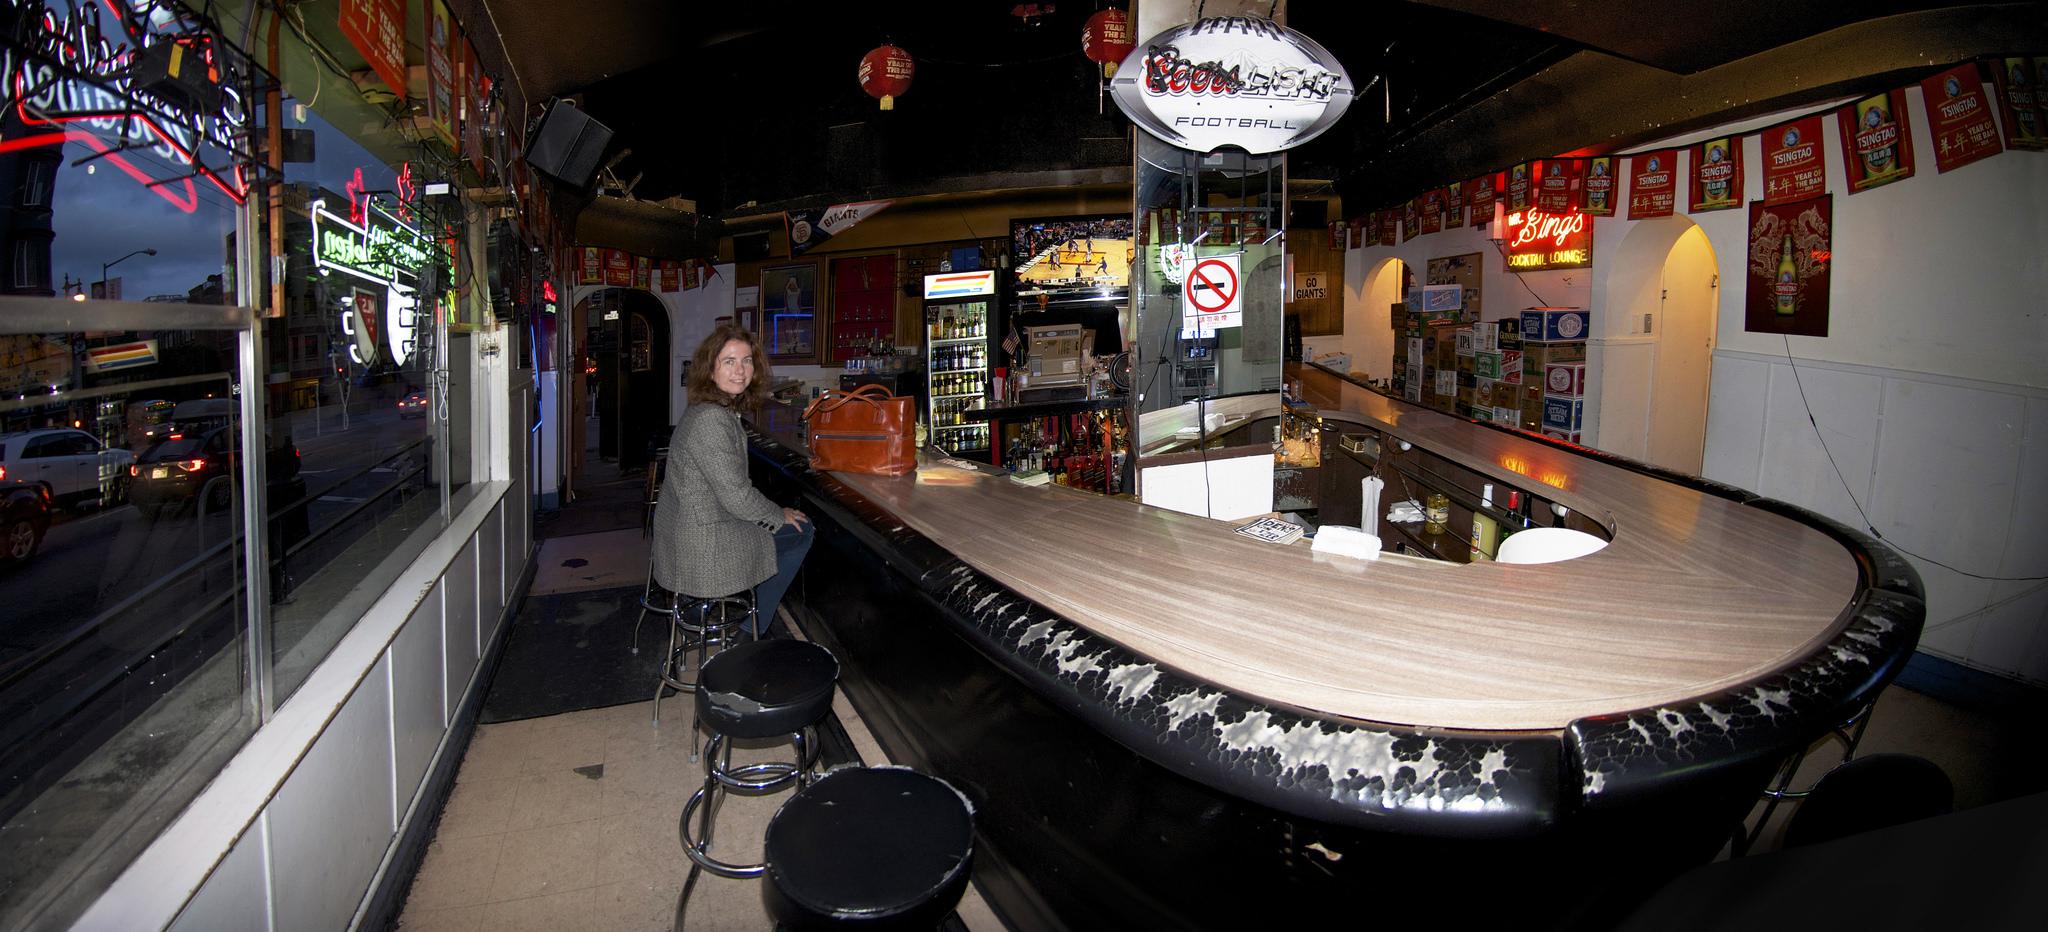 A dive bar in San Francisco.